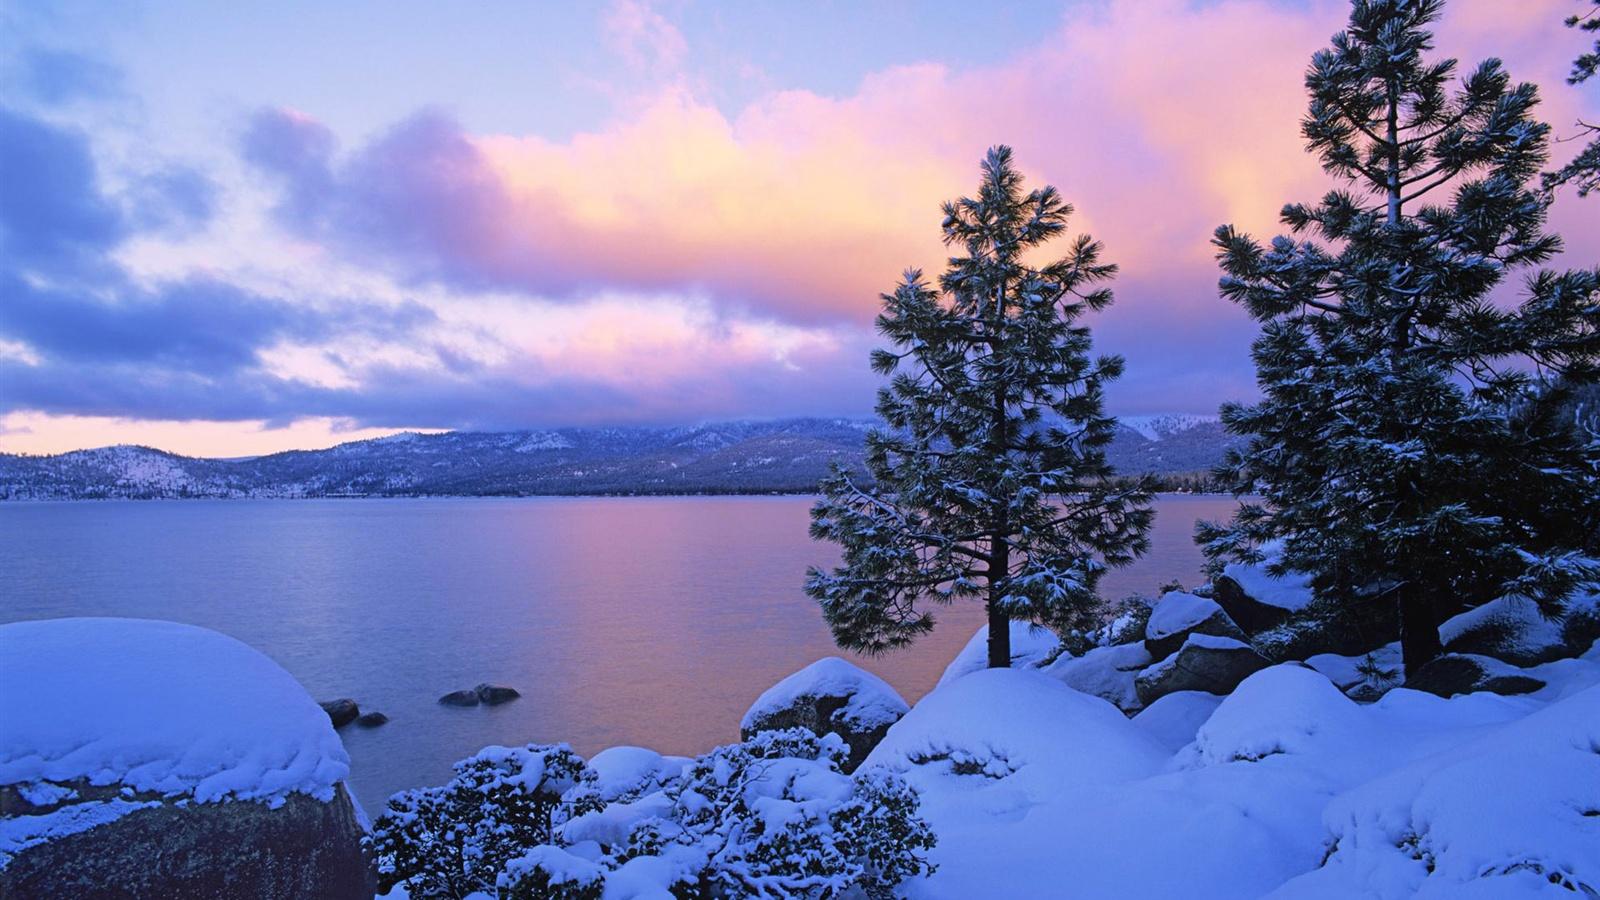 Lake at dusk in winter Wallpaper   1600x900 resolution ...